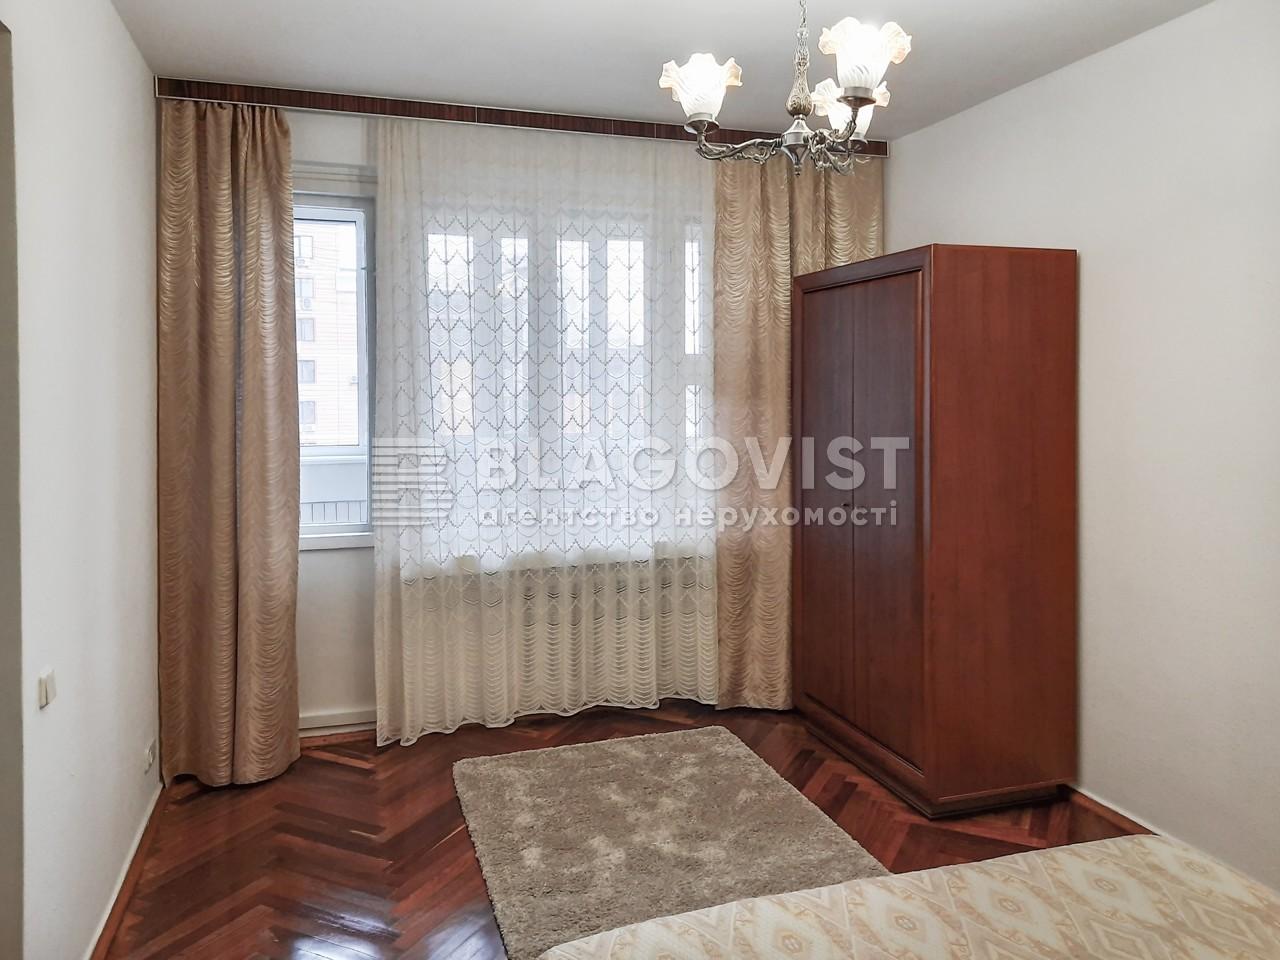 Квартира H-10944, Старонаводницкая, 4б, Киев - Фото 8